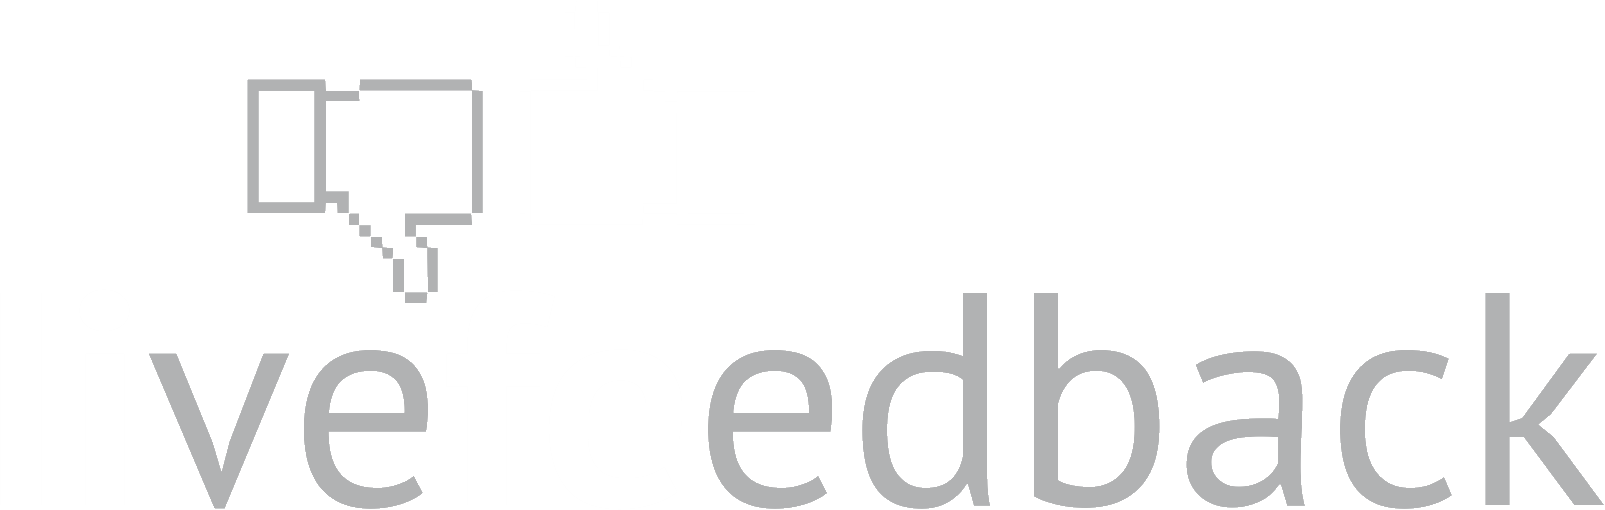 life - live feedback